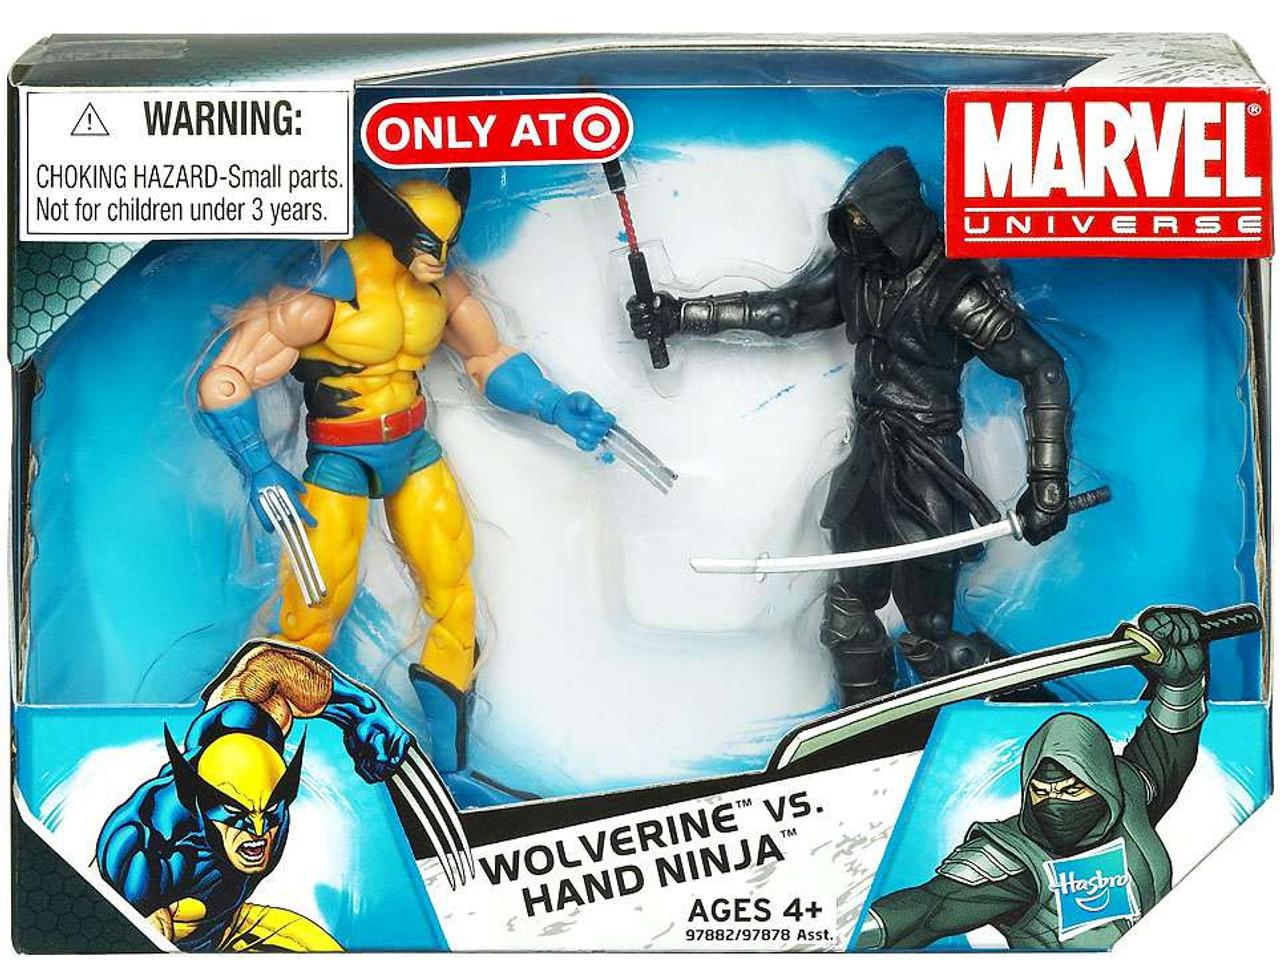 Marvel Universe Wolverine vs. Hand Ninja Exclusive Action Figure 2-Pack